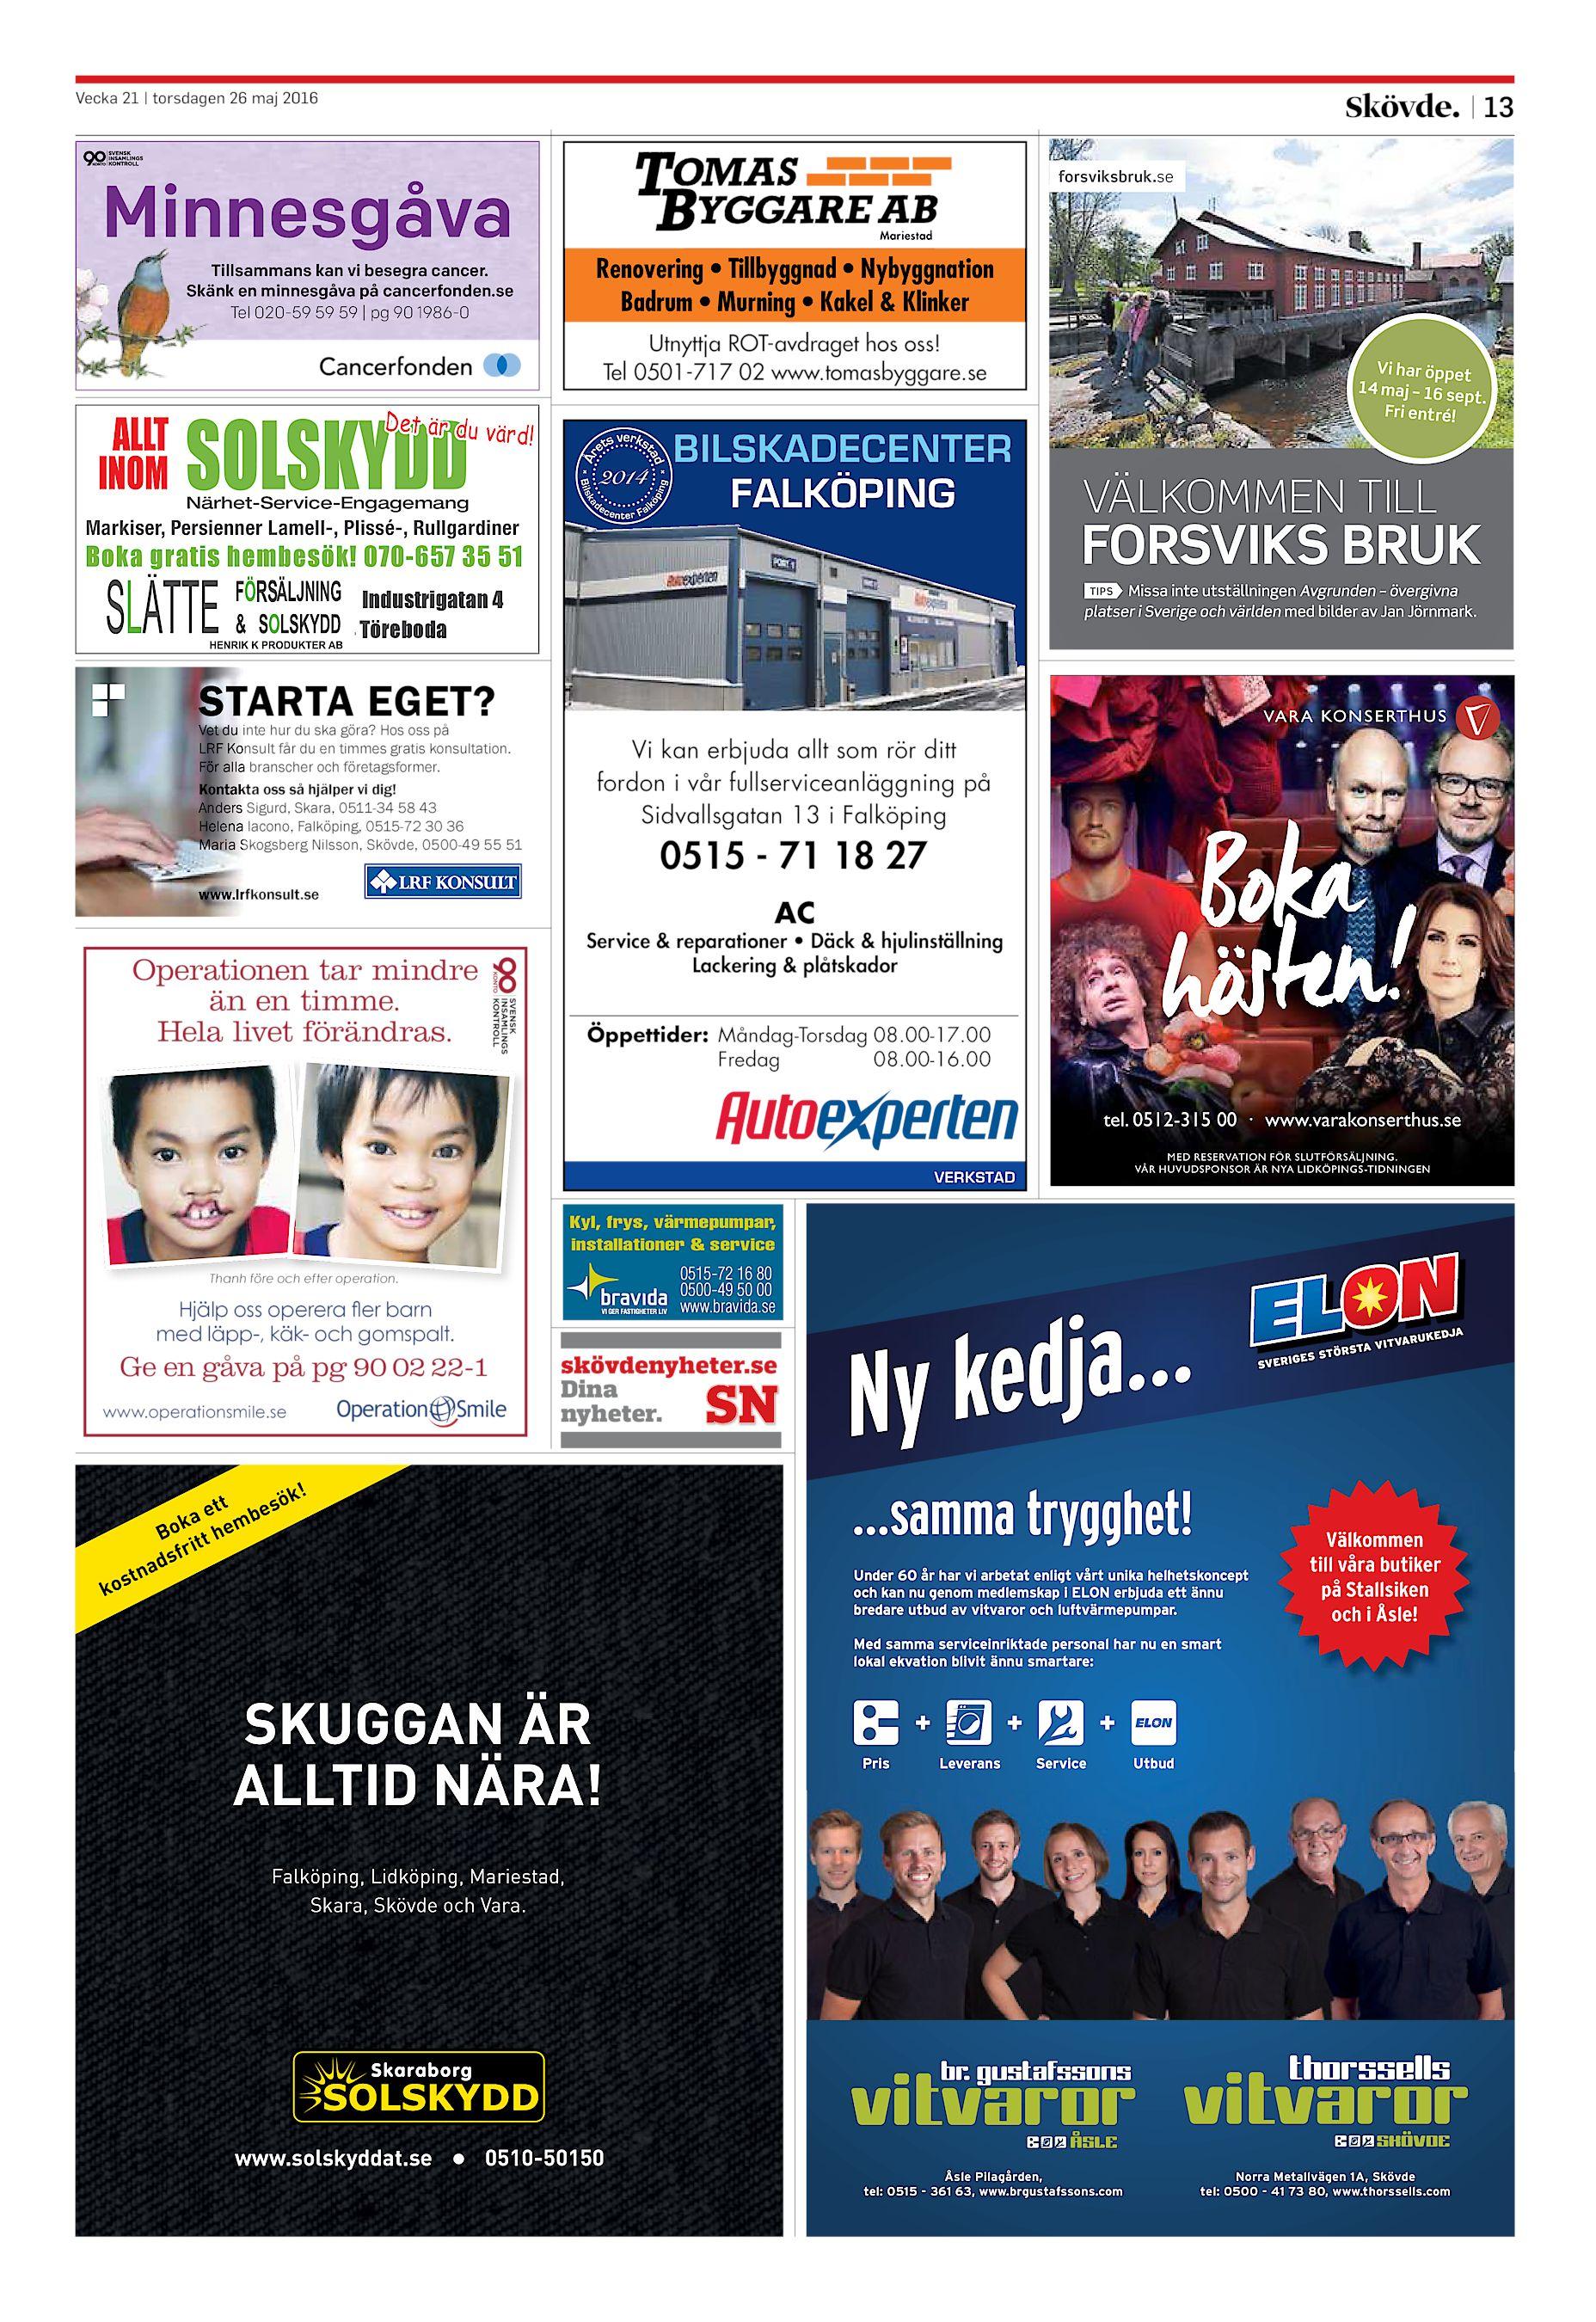 Skövde Nyheter SN-20160526 (endast text)